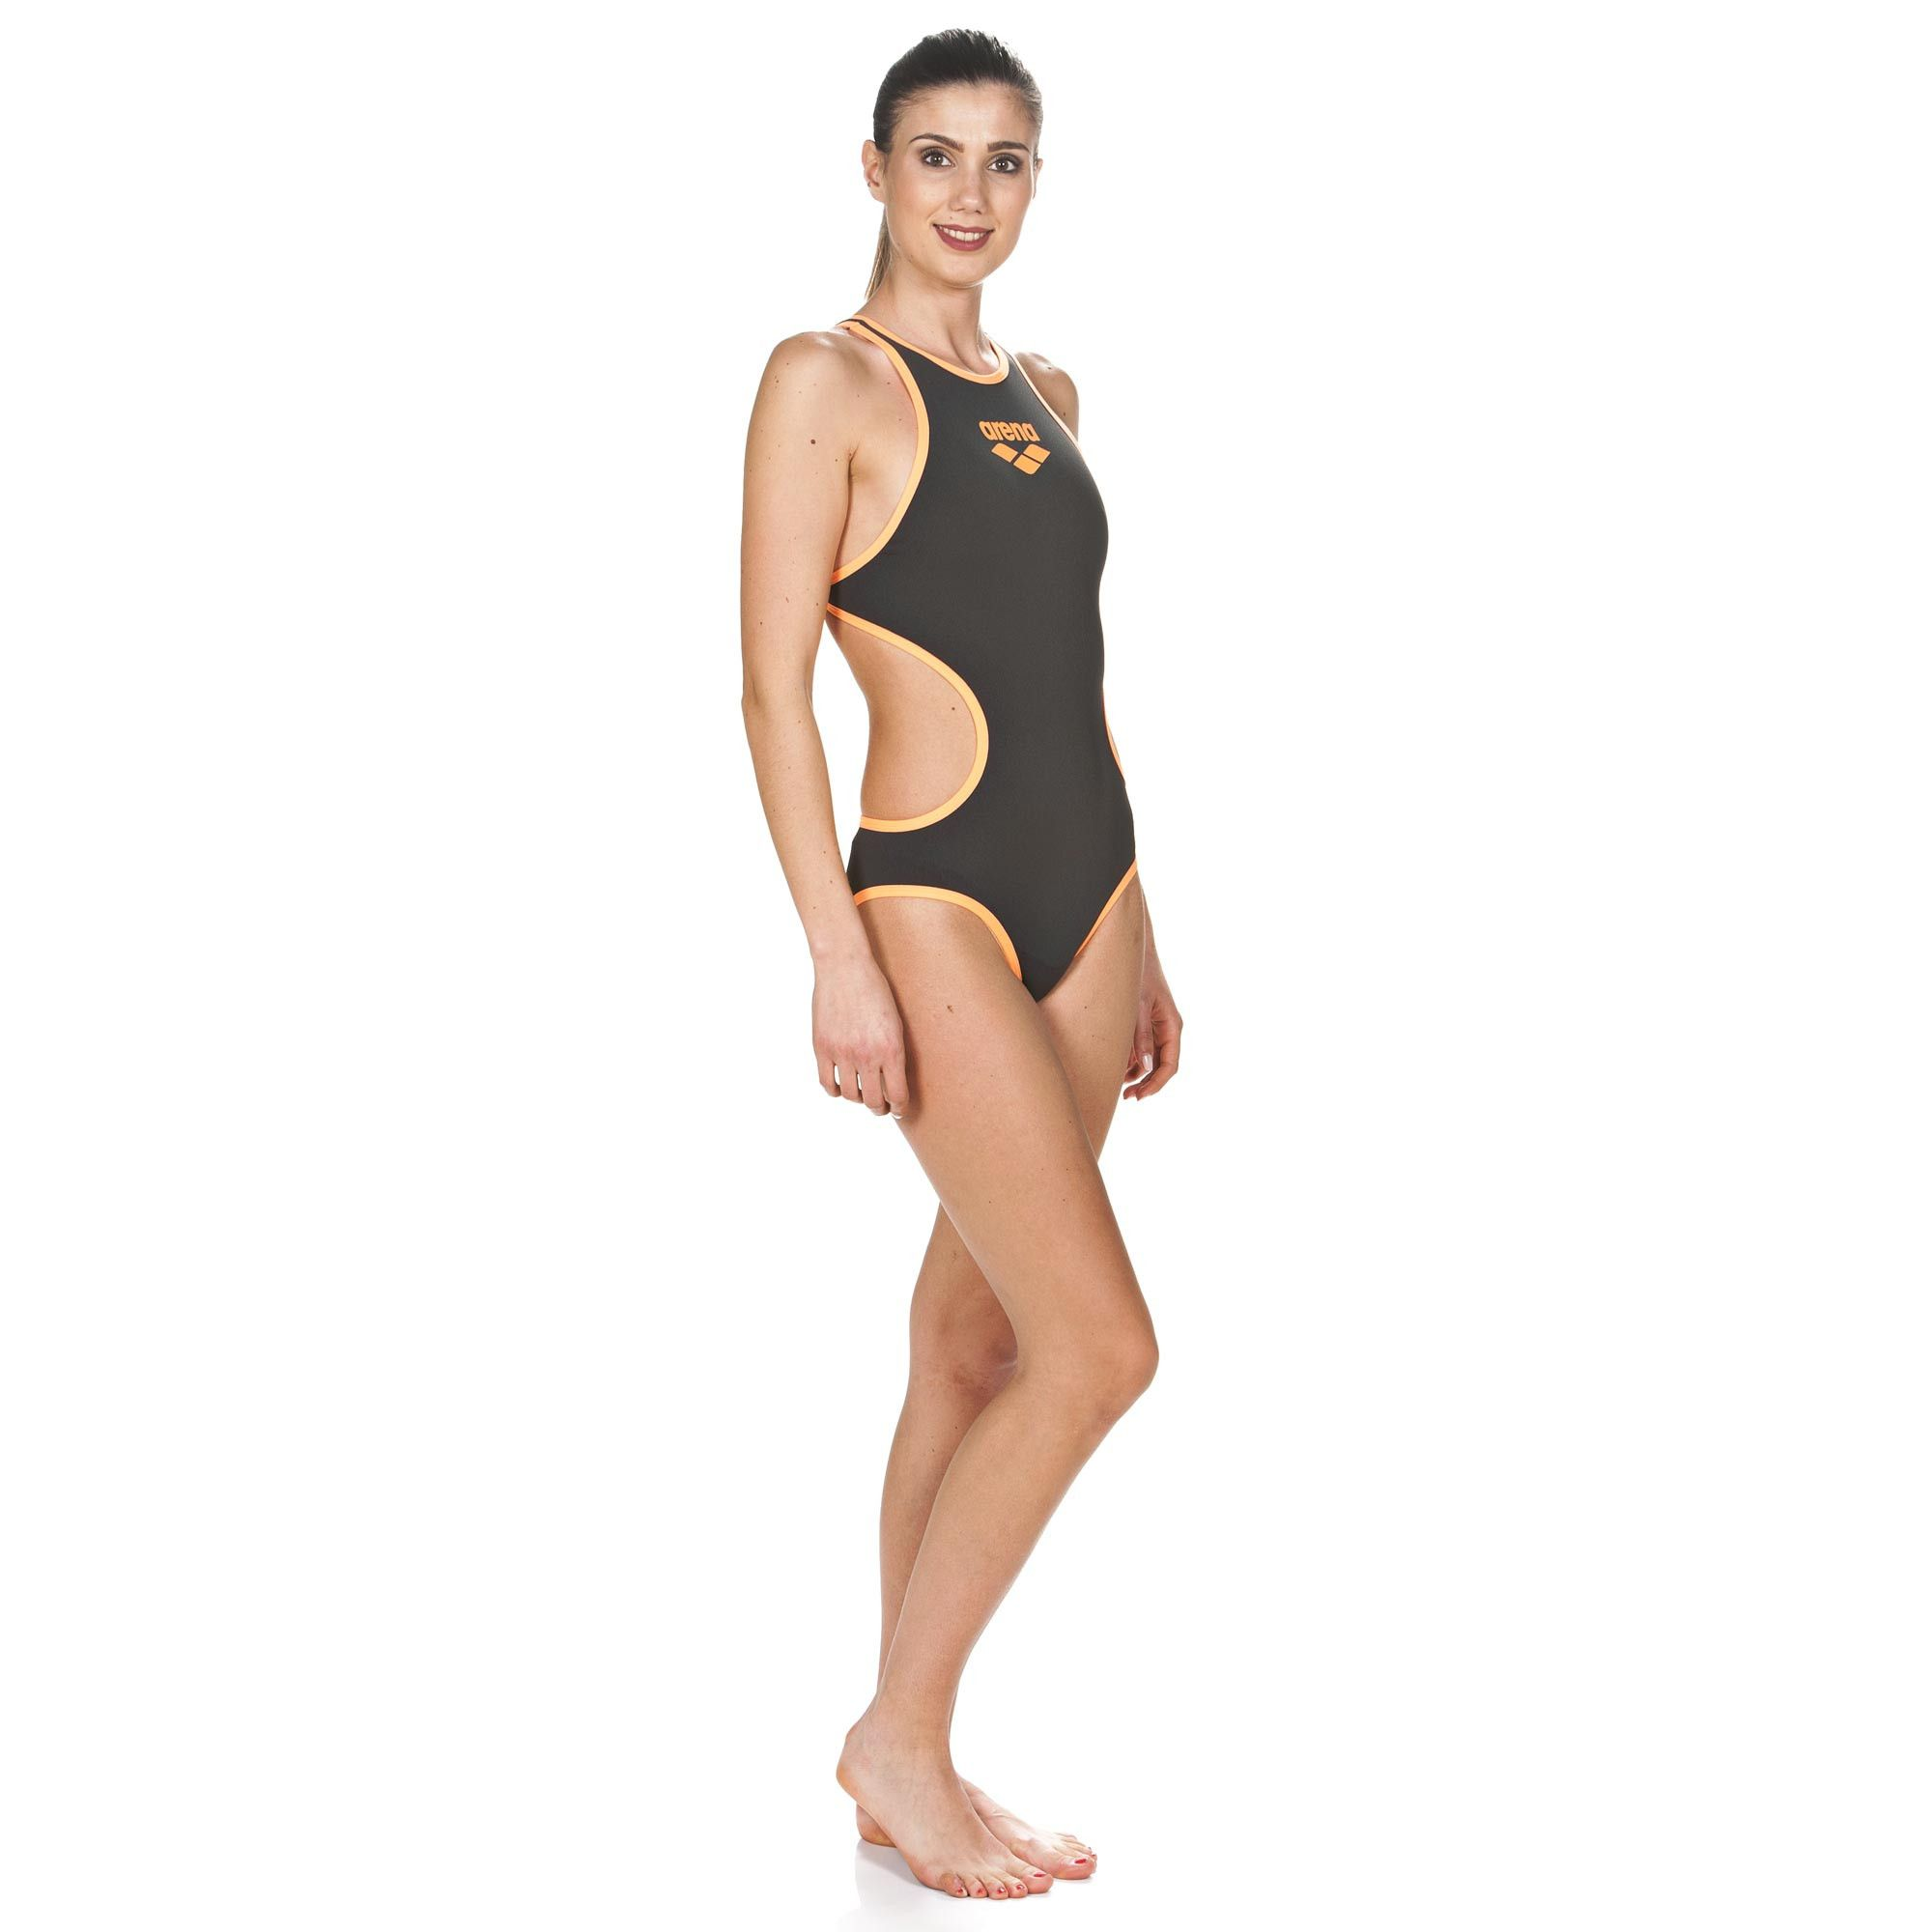 57154a91b9f37 Women's Arena One Biglogo One Piece Swimsuit | arena Training ...